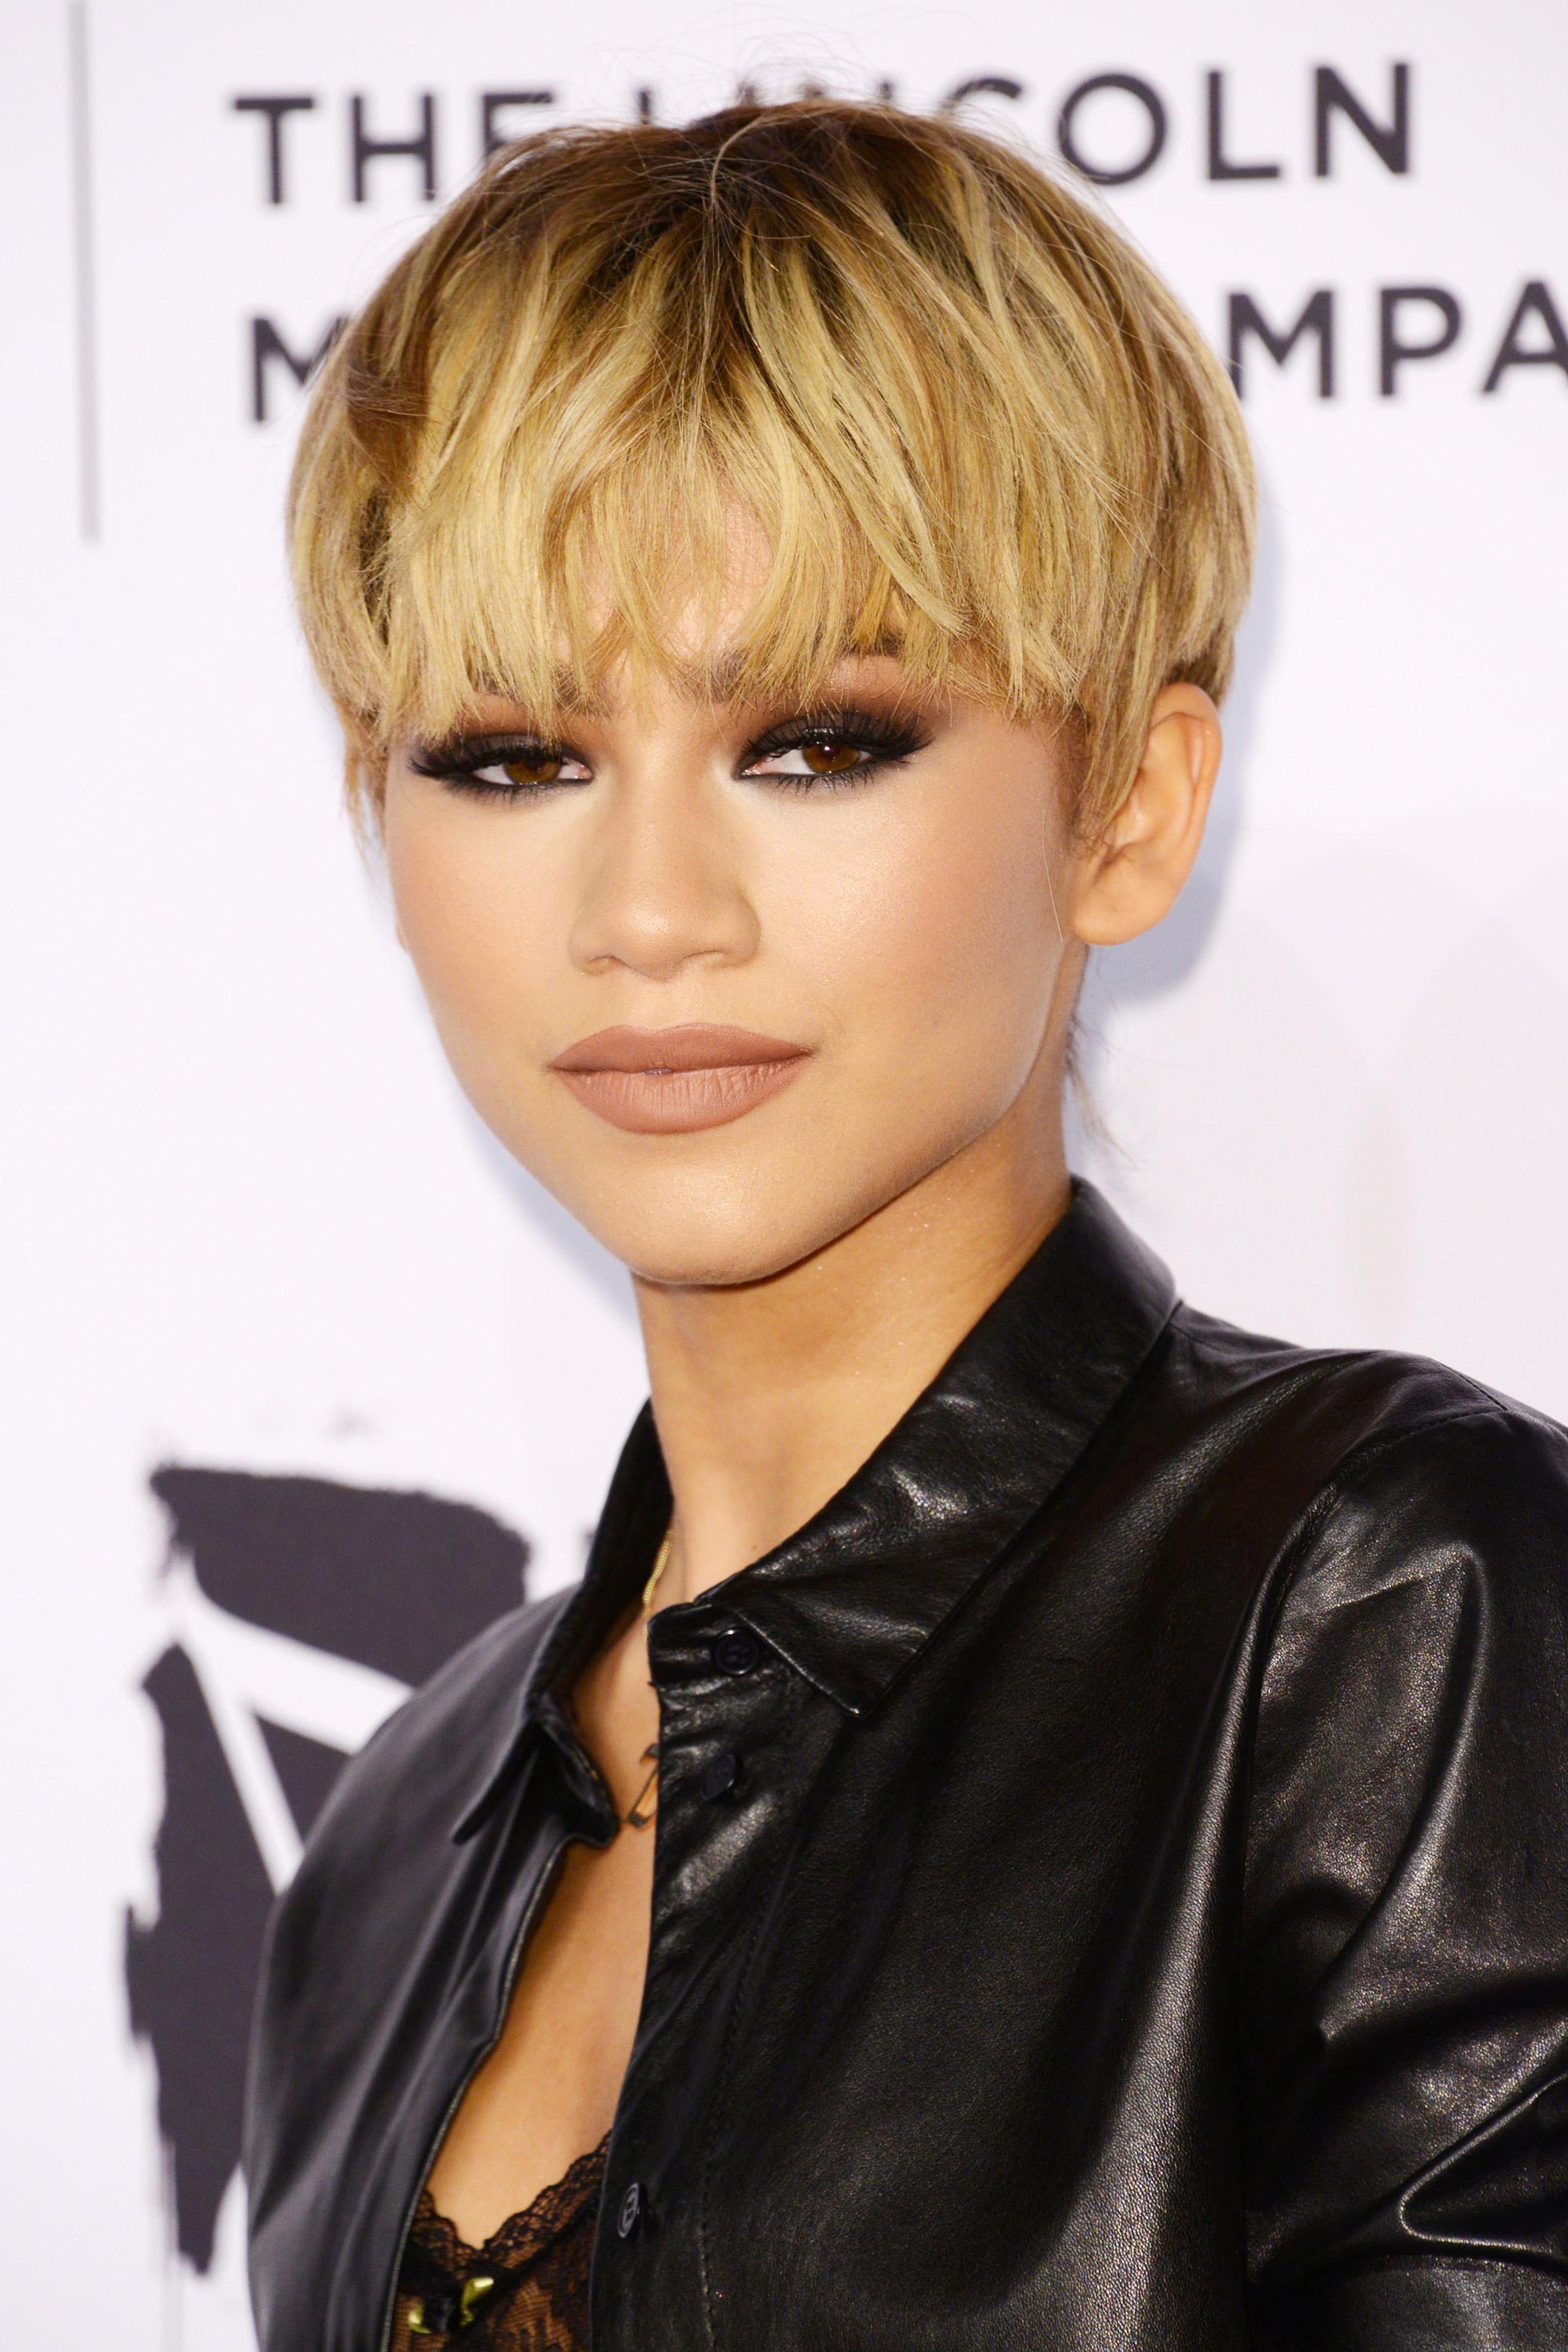 Amazing 40 Best Pixie Cuts Iconic Celebrity Pixie Hairstyles Short Hairstyles Gunalazisus